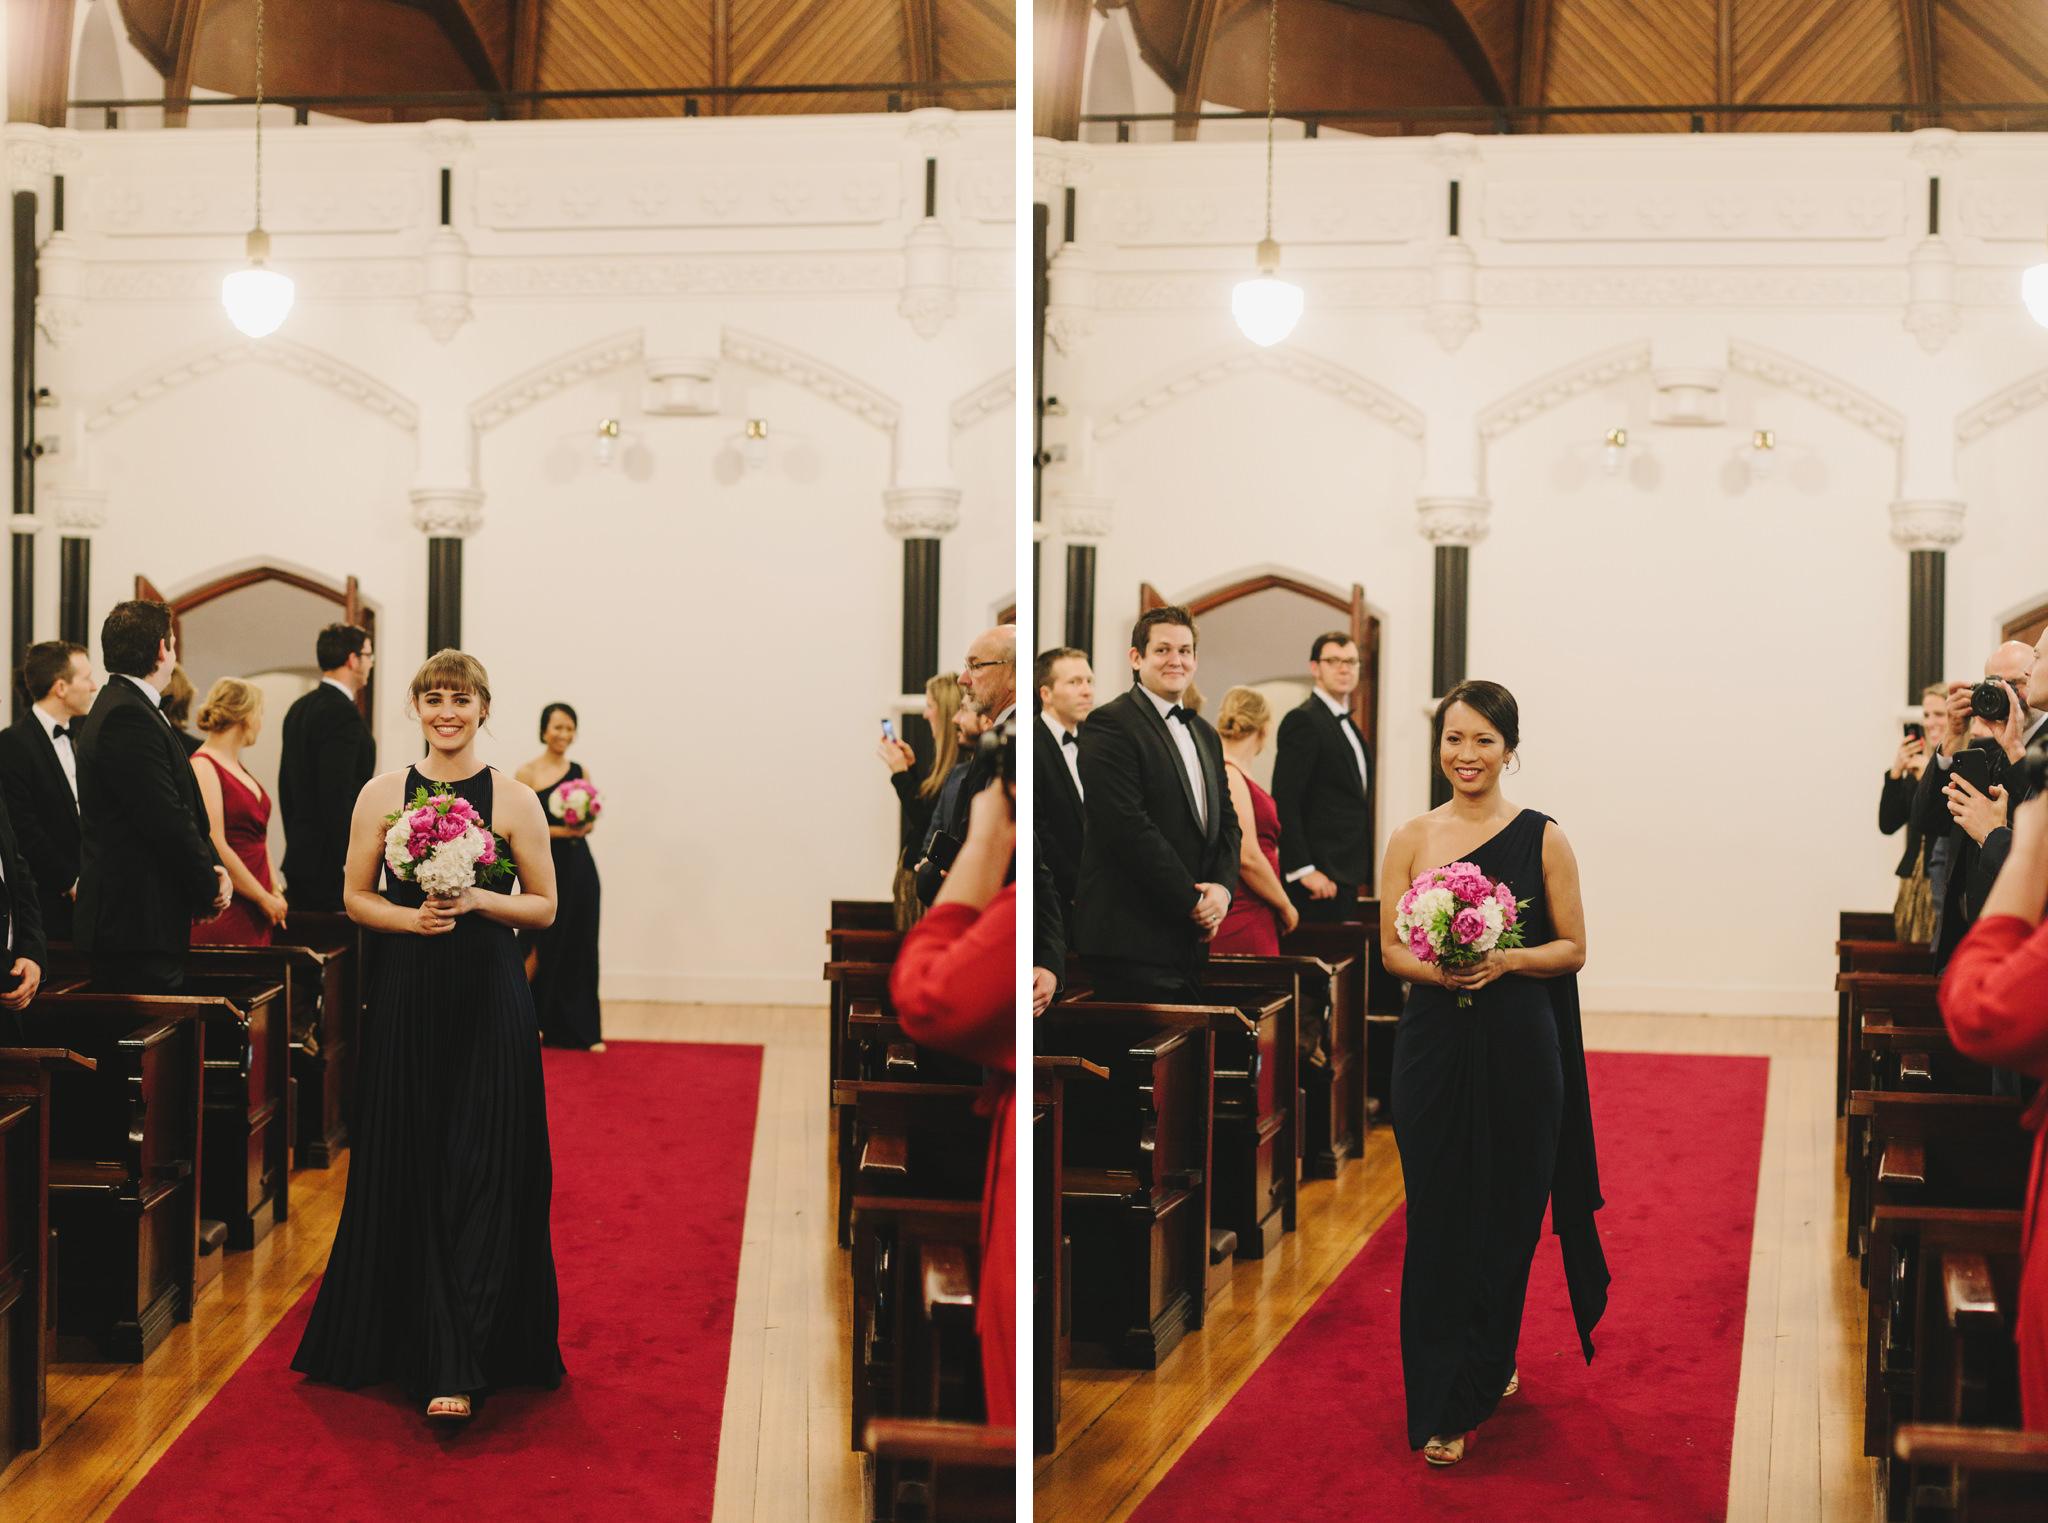 Abbotsford_Convent_Wedding_Peter_Anna047.JPG